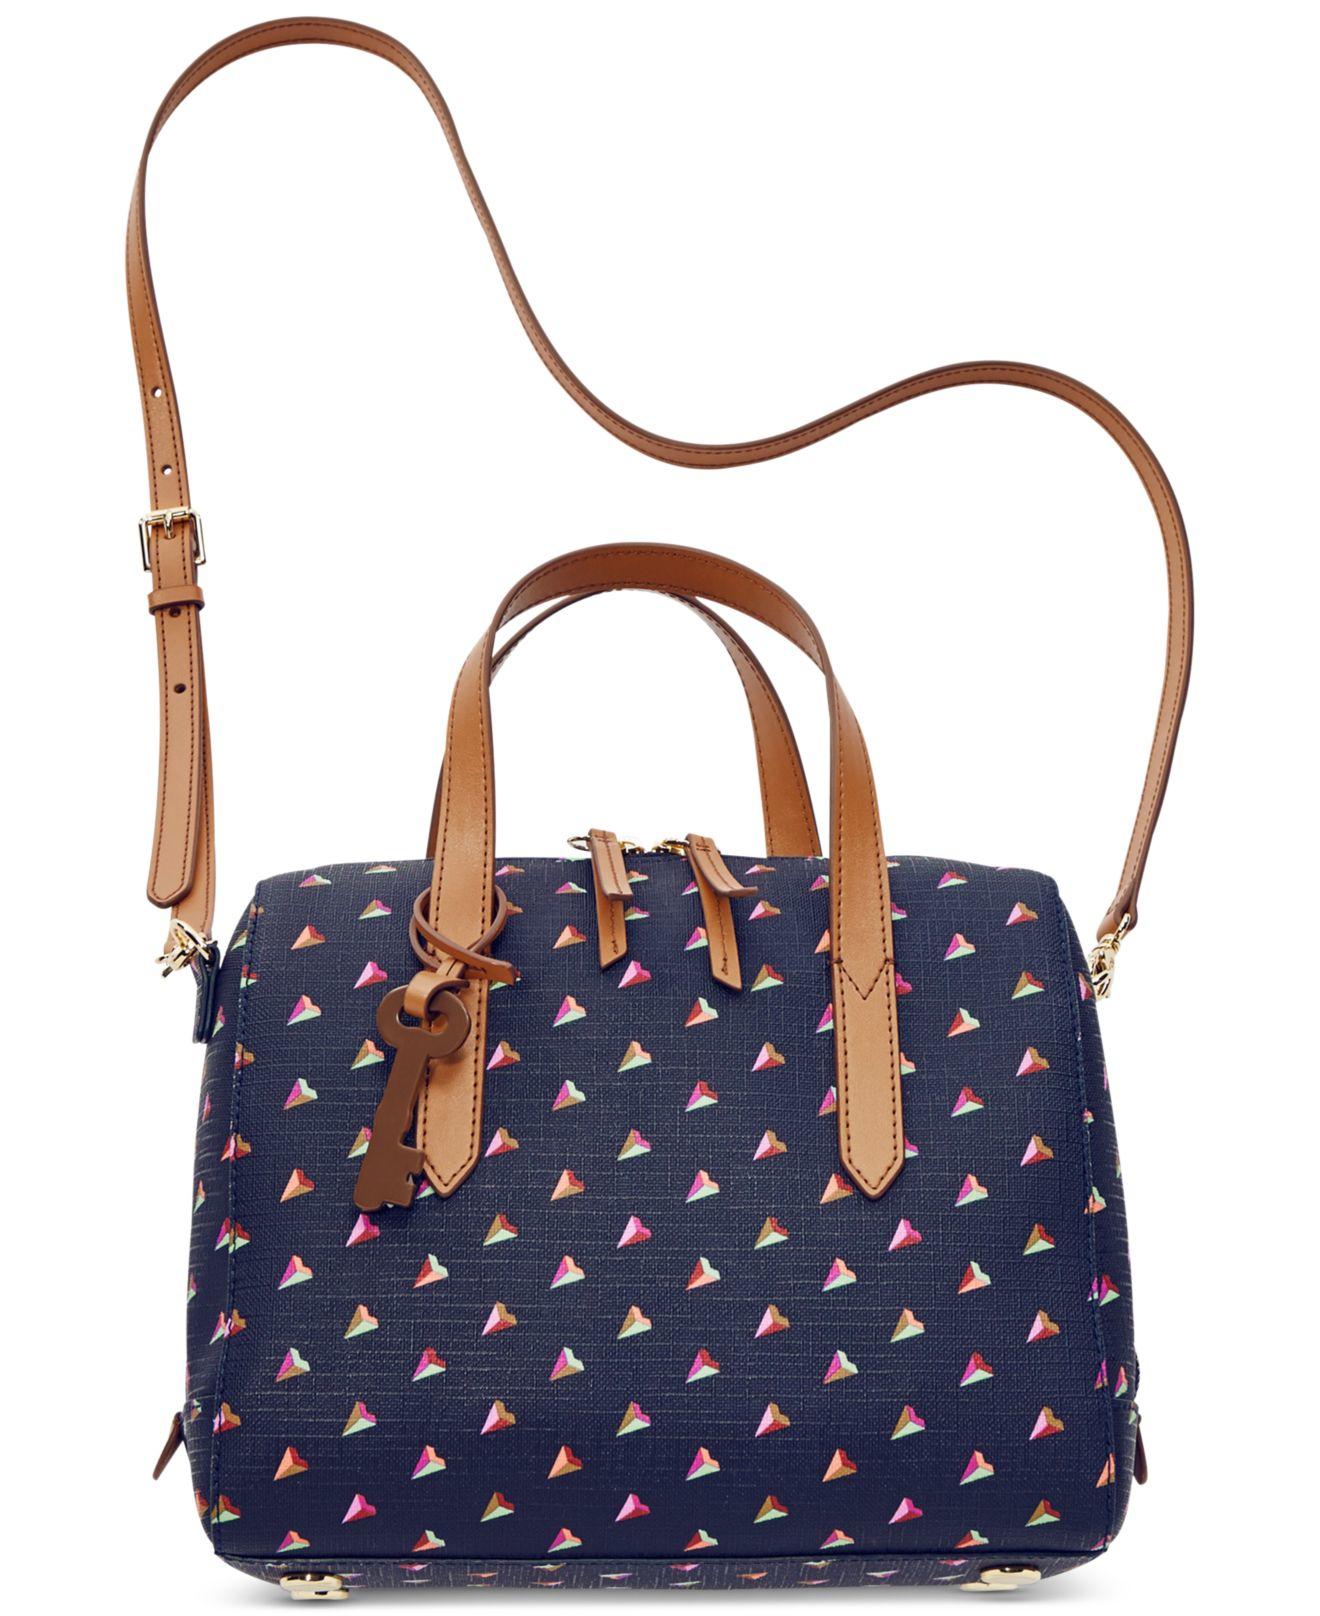 Fossil Sydney Printed Hearts Satchel Bag in Blue | Lyst